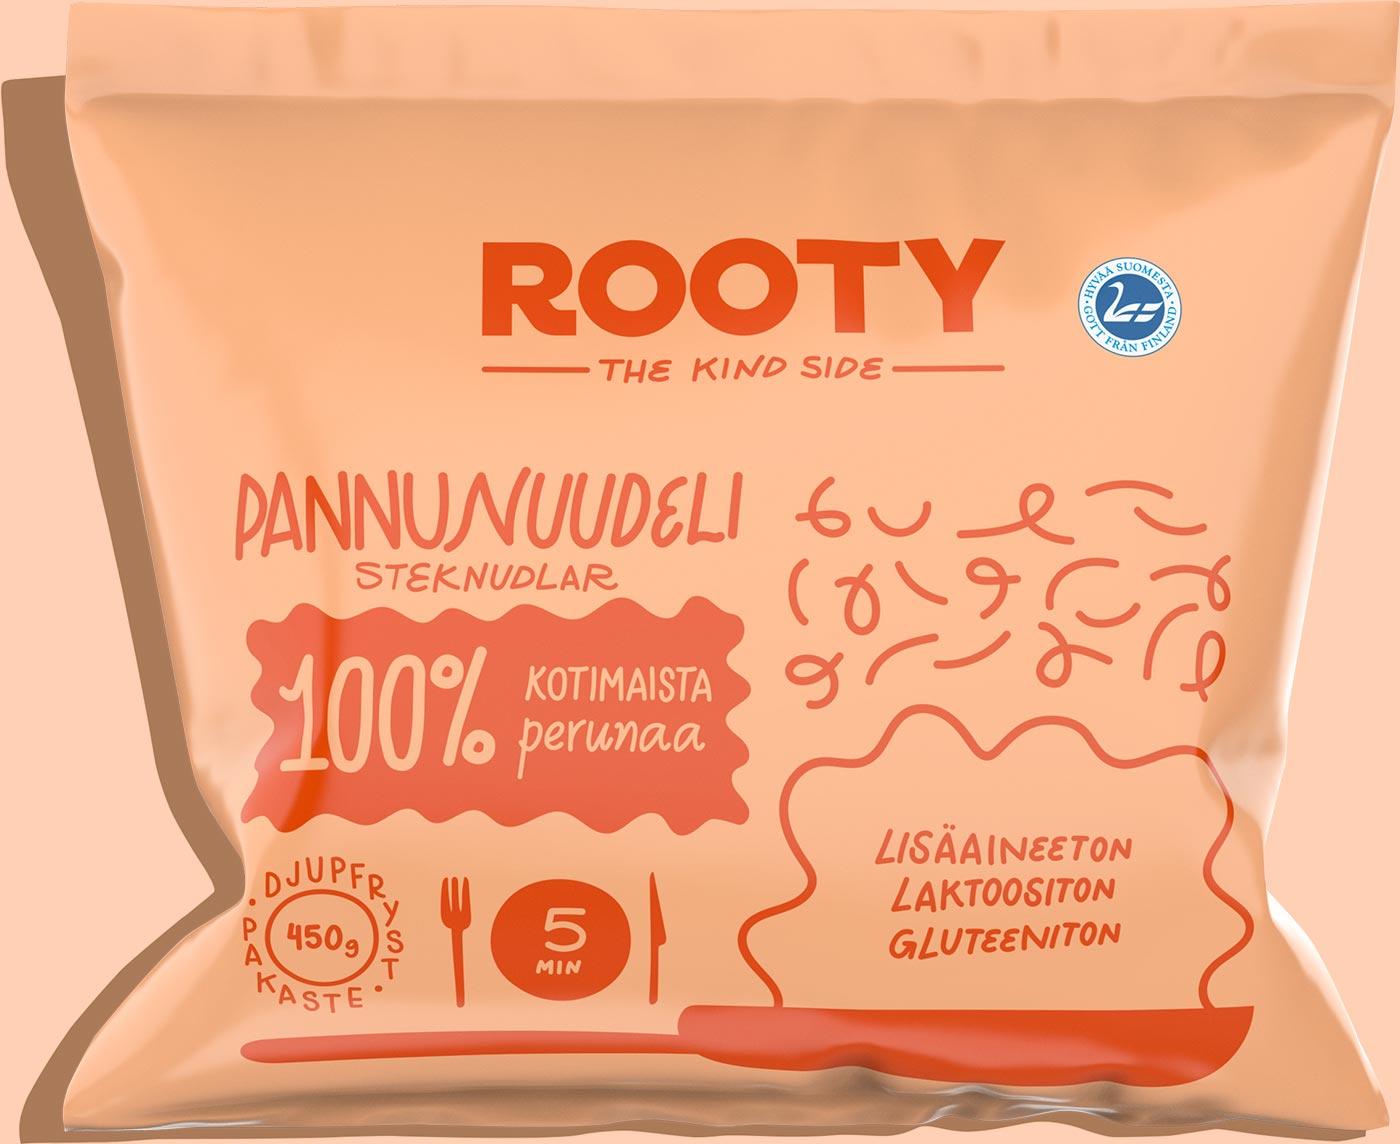 Rooty - pannunuudeli